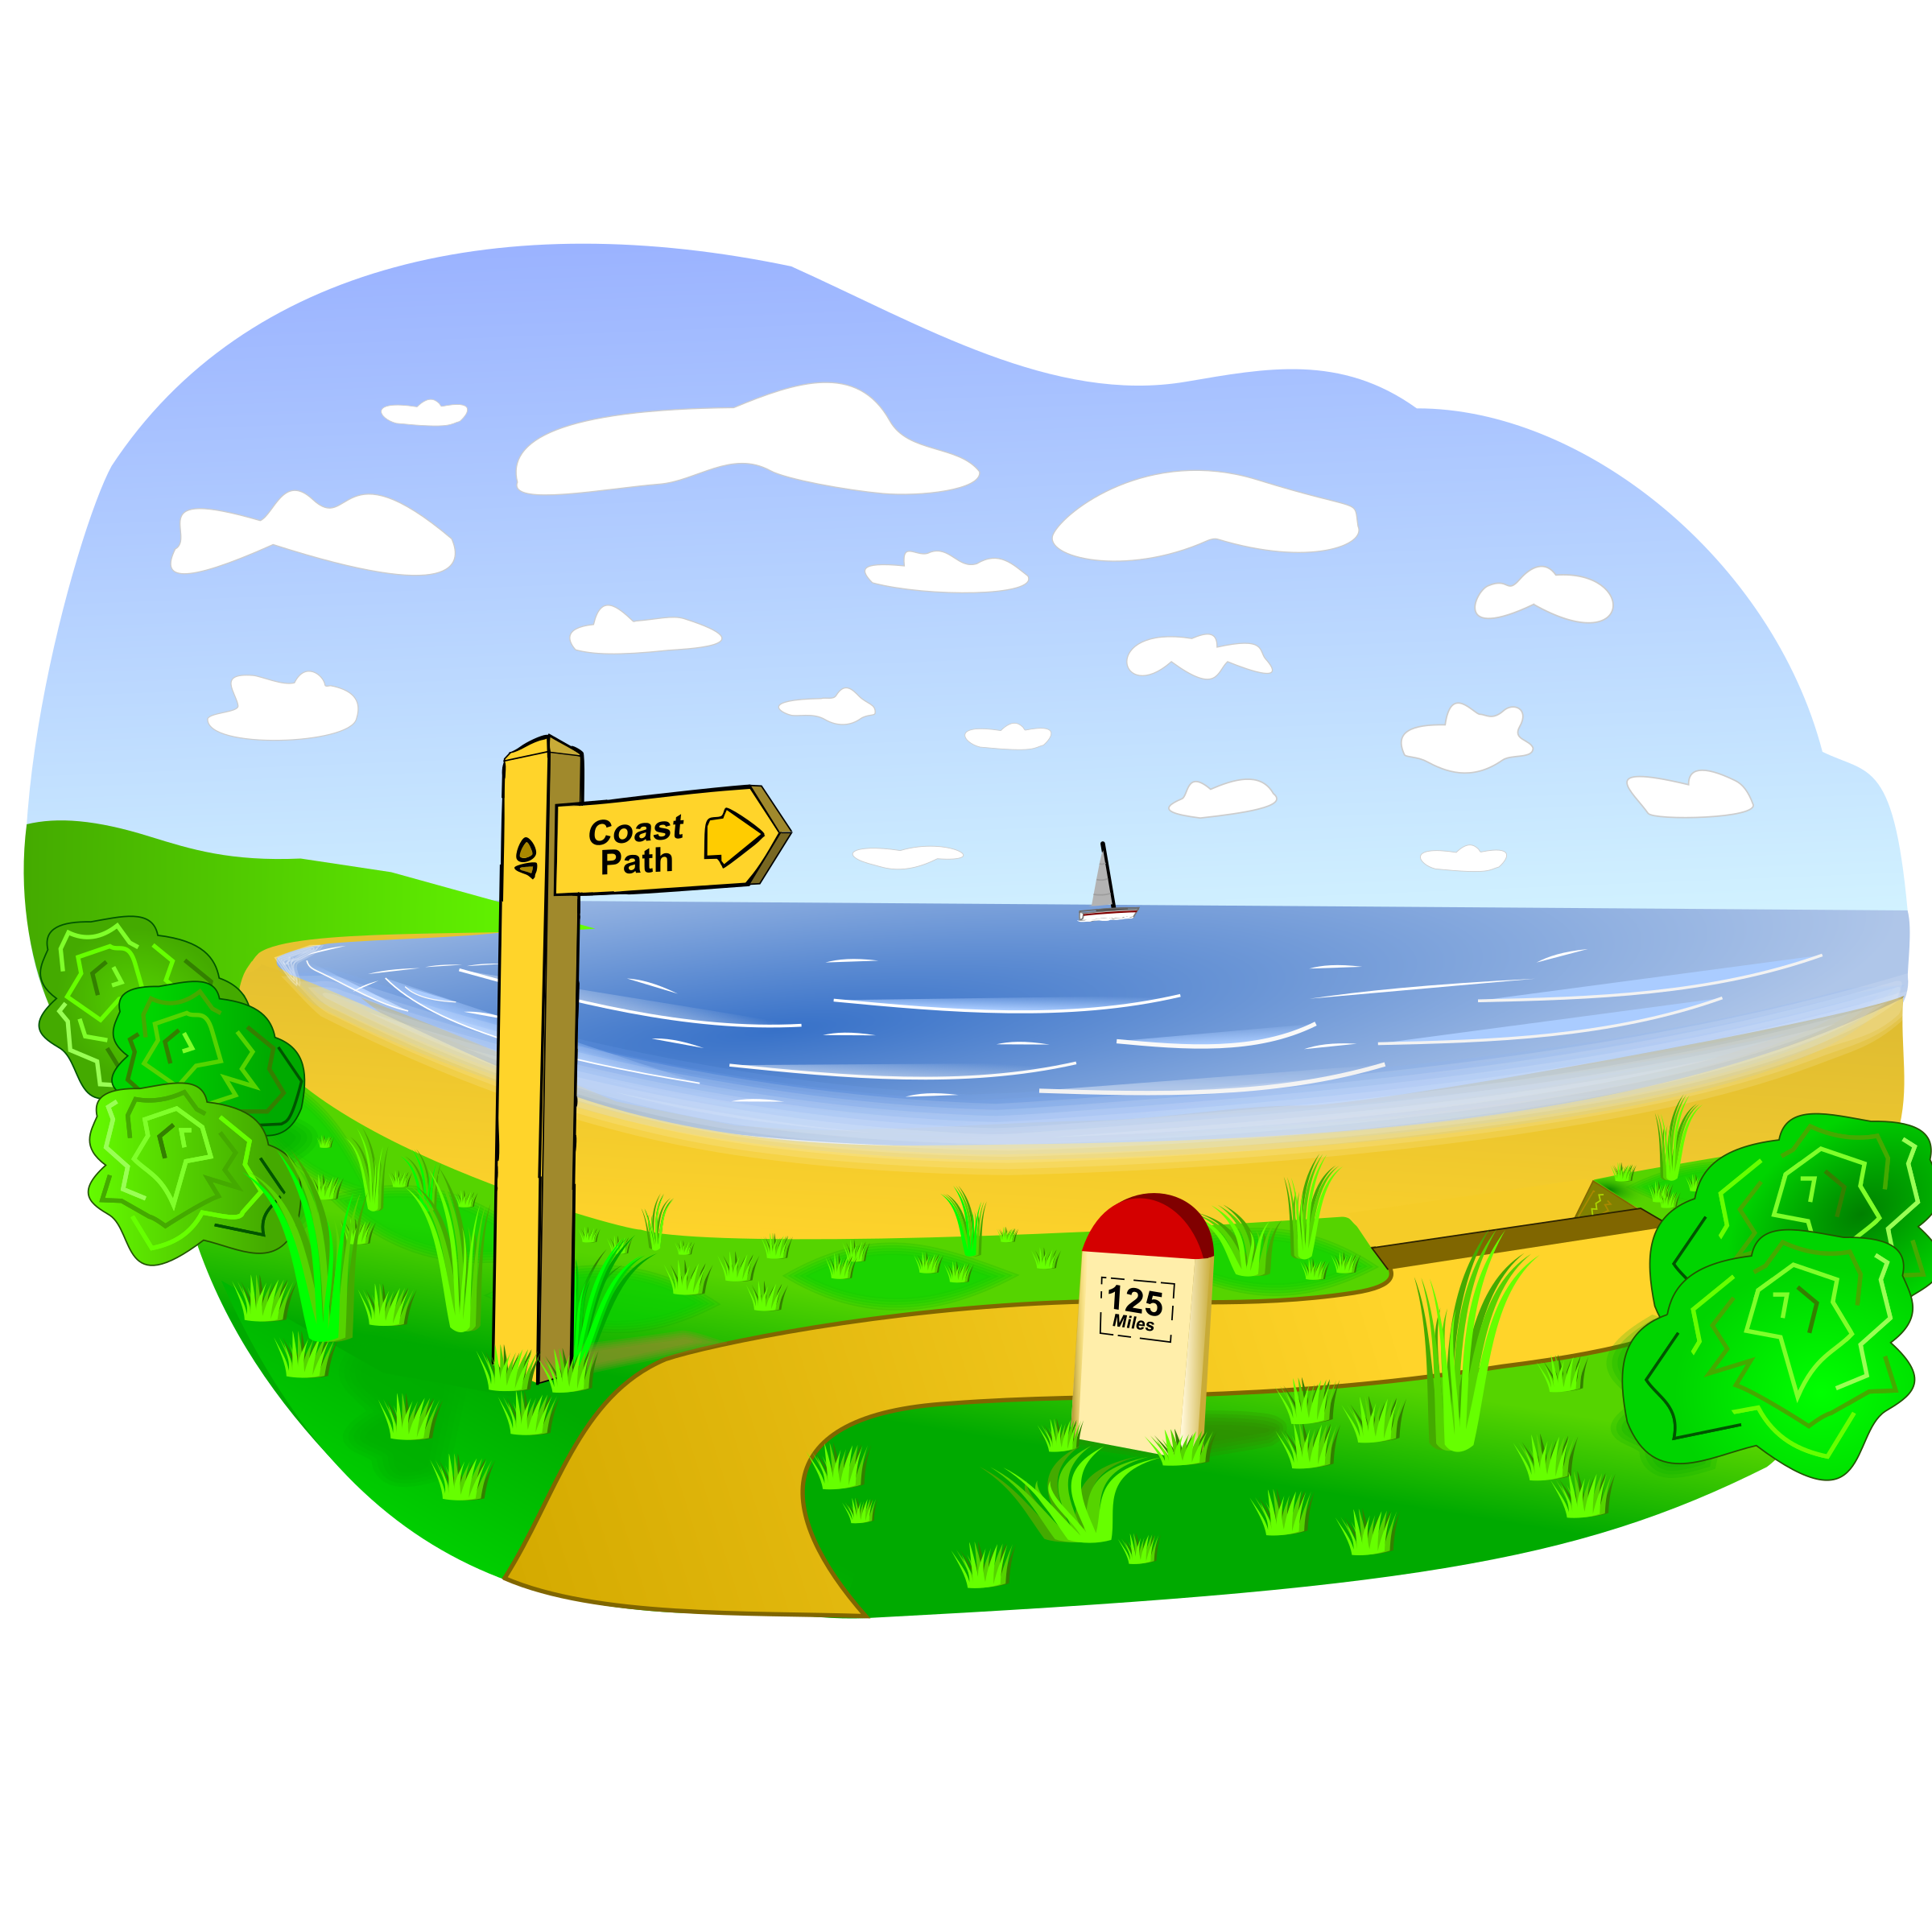 Clipart coast banner Free Coastal Cliparts, Download Free Clip Art, Free Clip Art on ... banner